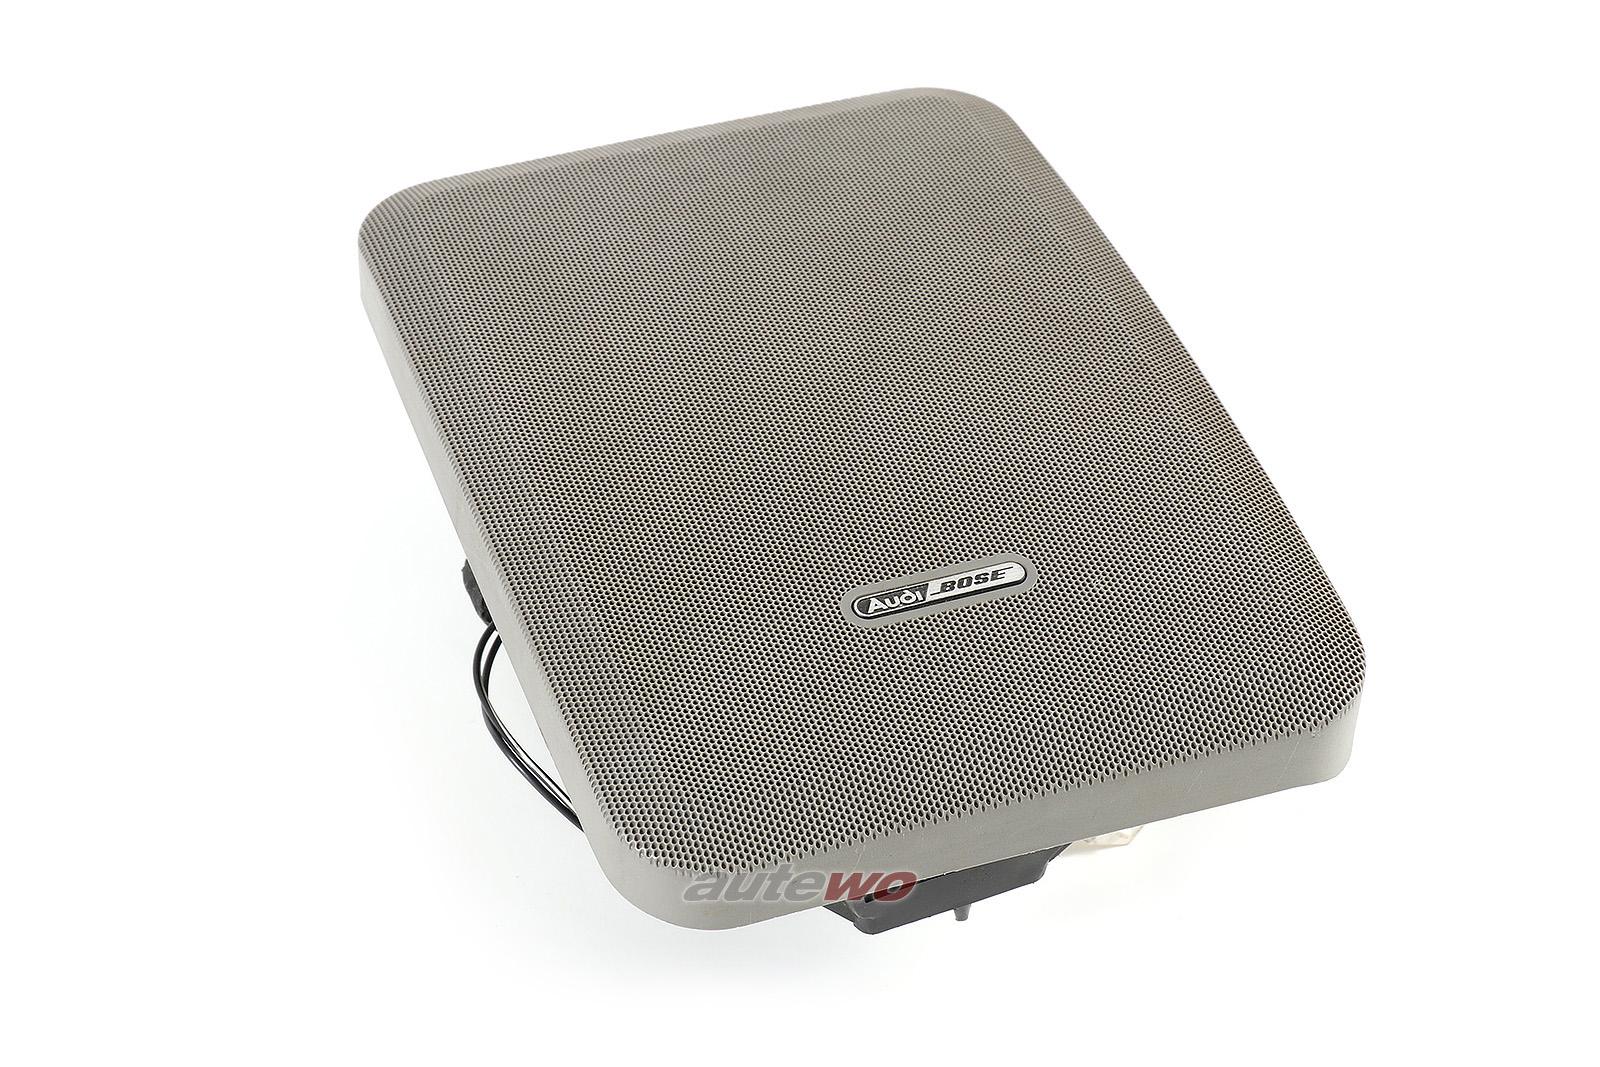 4a5035401c audi 100 s4 a6 s6 c4 lautsprecher bose. Black Bedroom Furniture Sets. Home Design Ideas